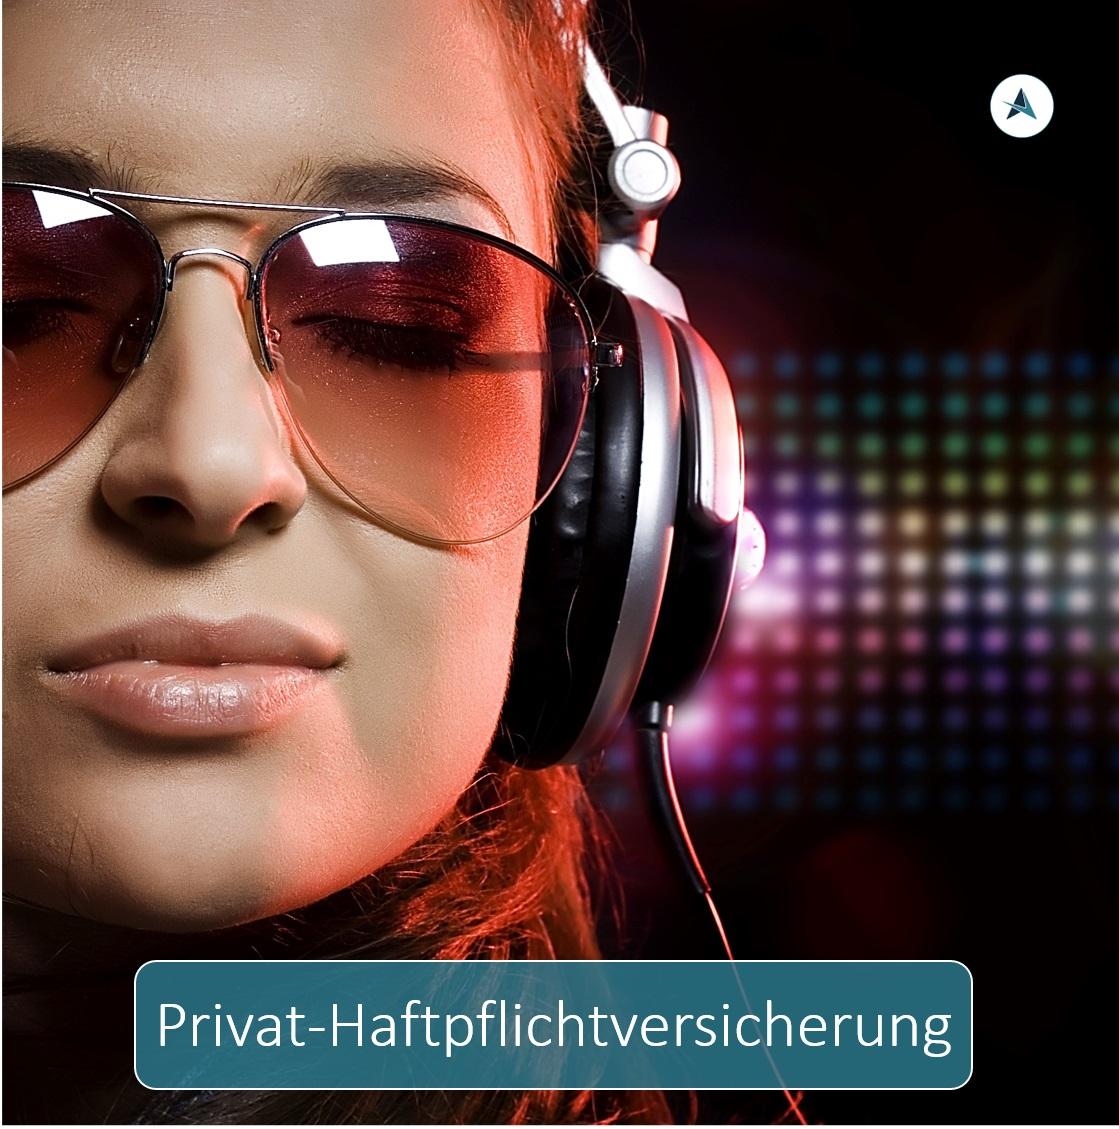 Kaulsdorf-Versicherungsmakler-Berlin-Haftpflichtversicherung-private-Haftpflichtversicherung-Privathaftpflichtversicherung-André-Böttcher-Haftpflicht